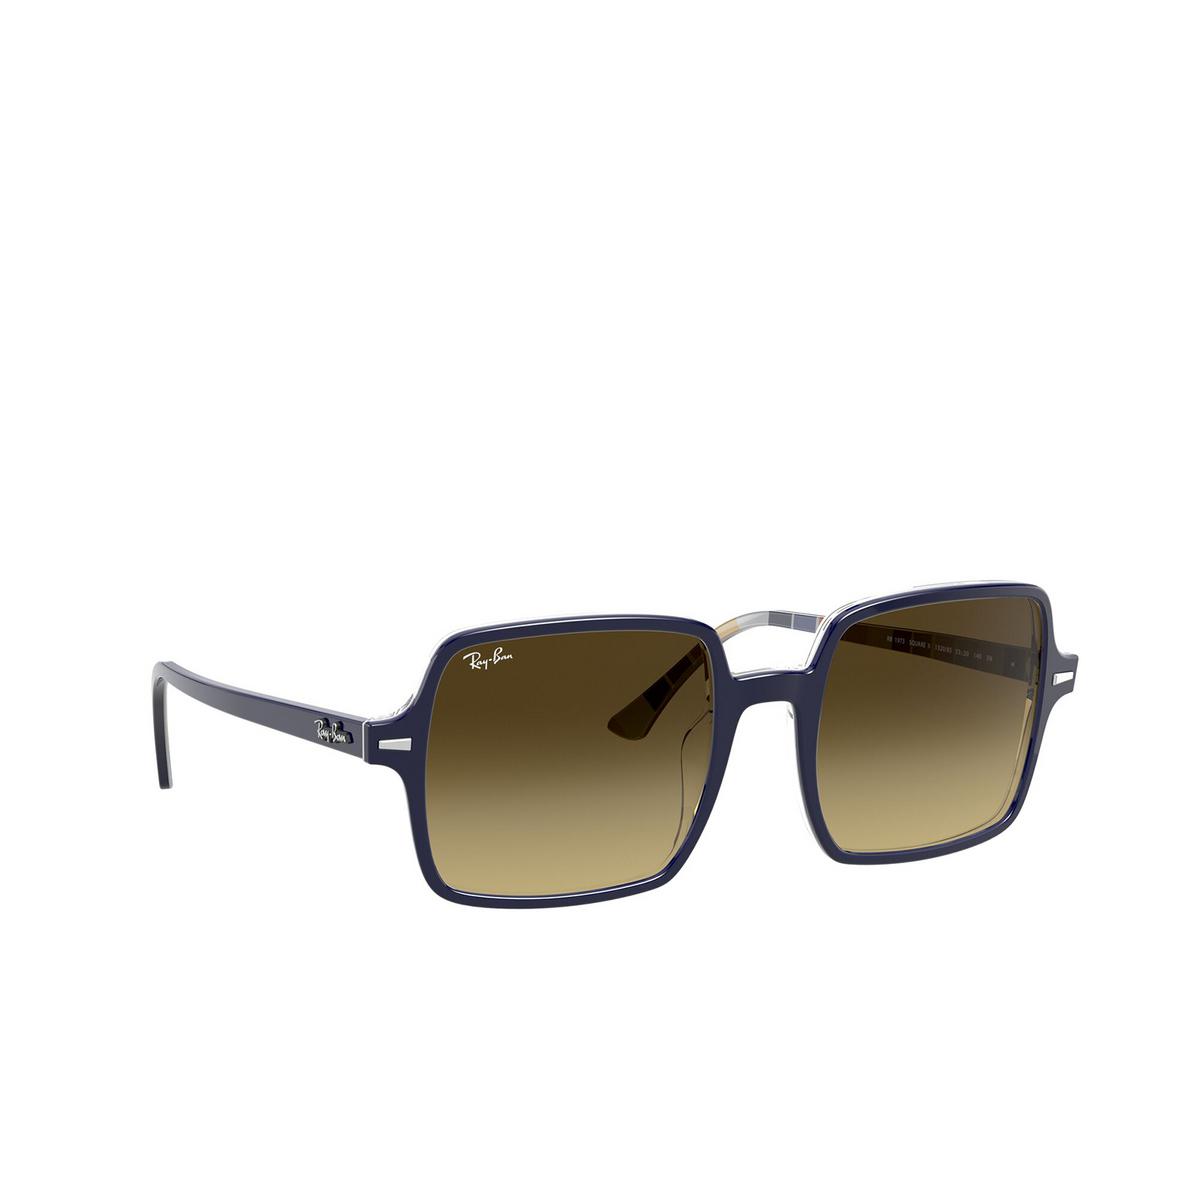 Ray-Ban® Square Sunglasses: Square Ii RB1973 color Blue Stripes 132085 - three-quarters view.